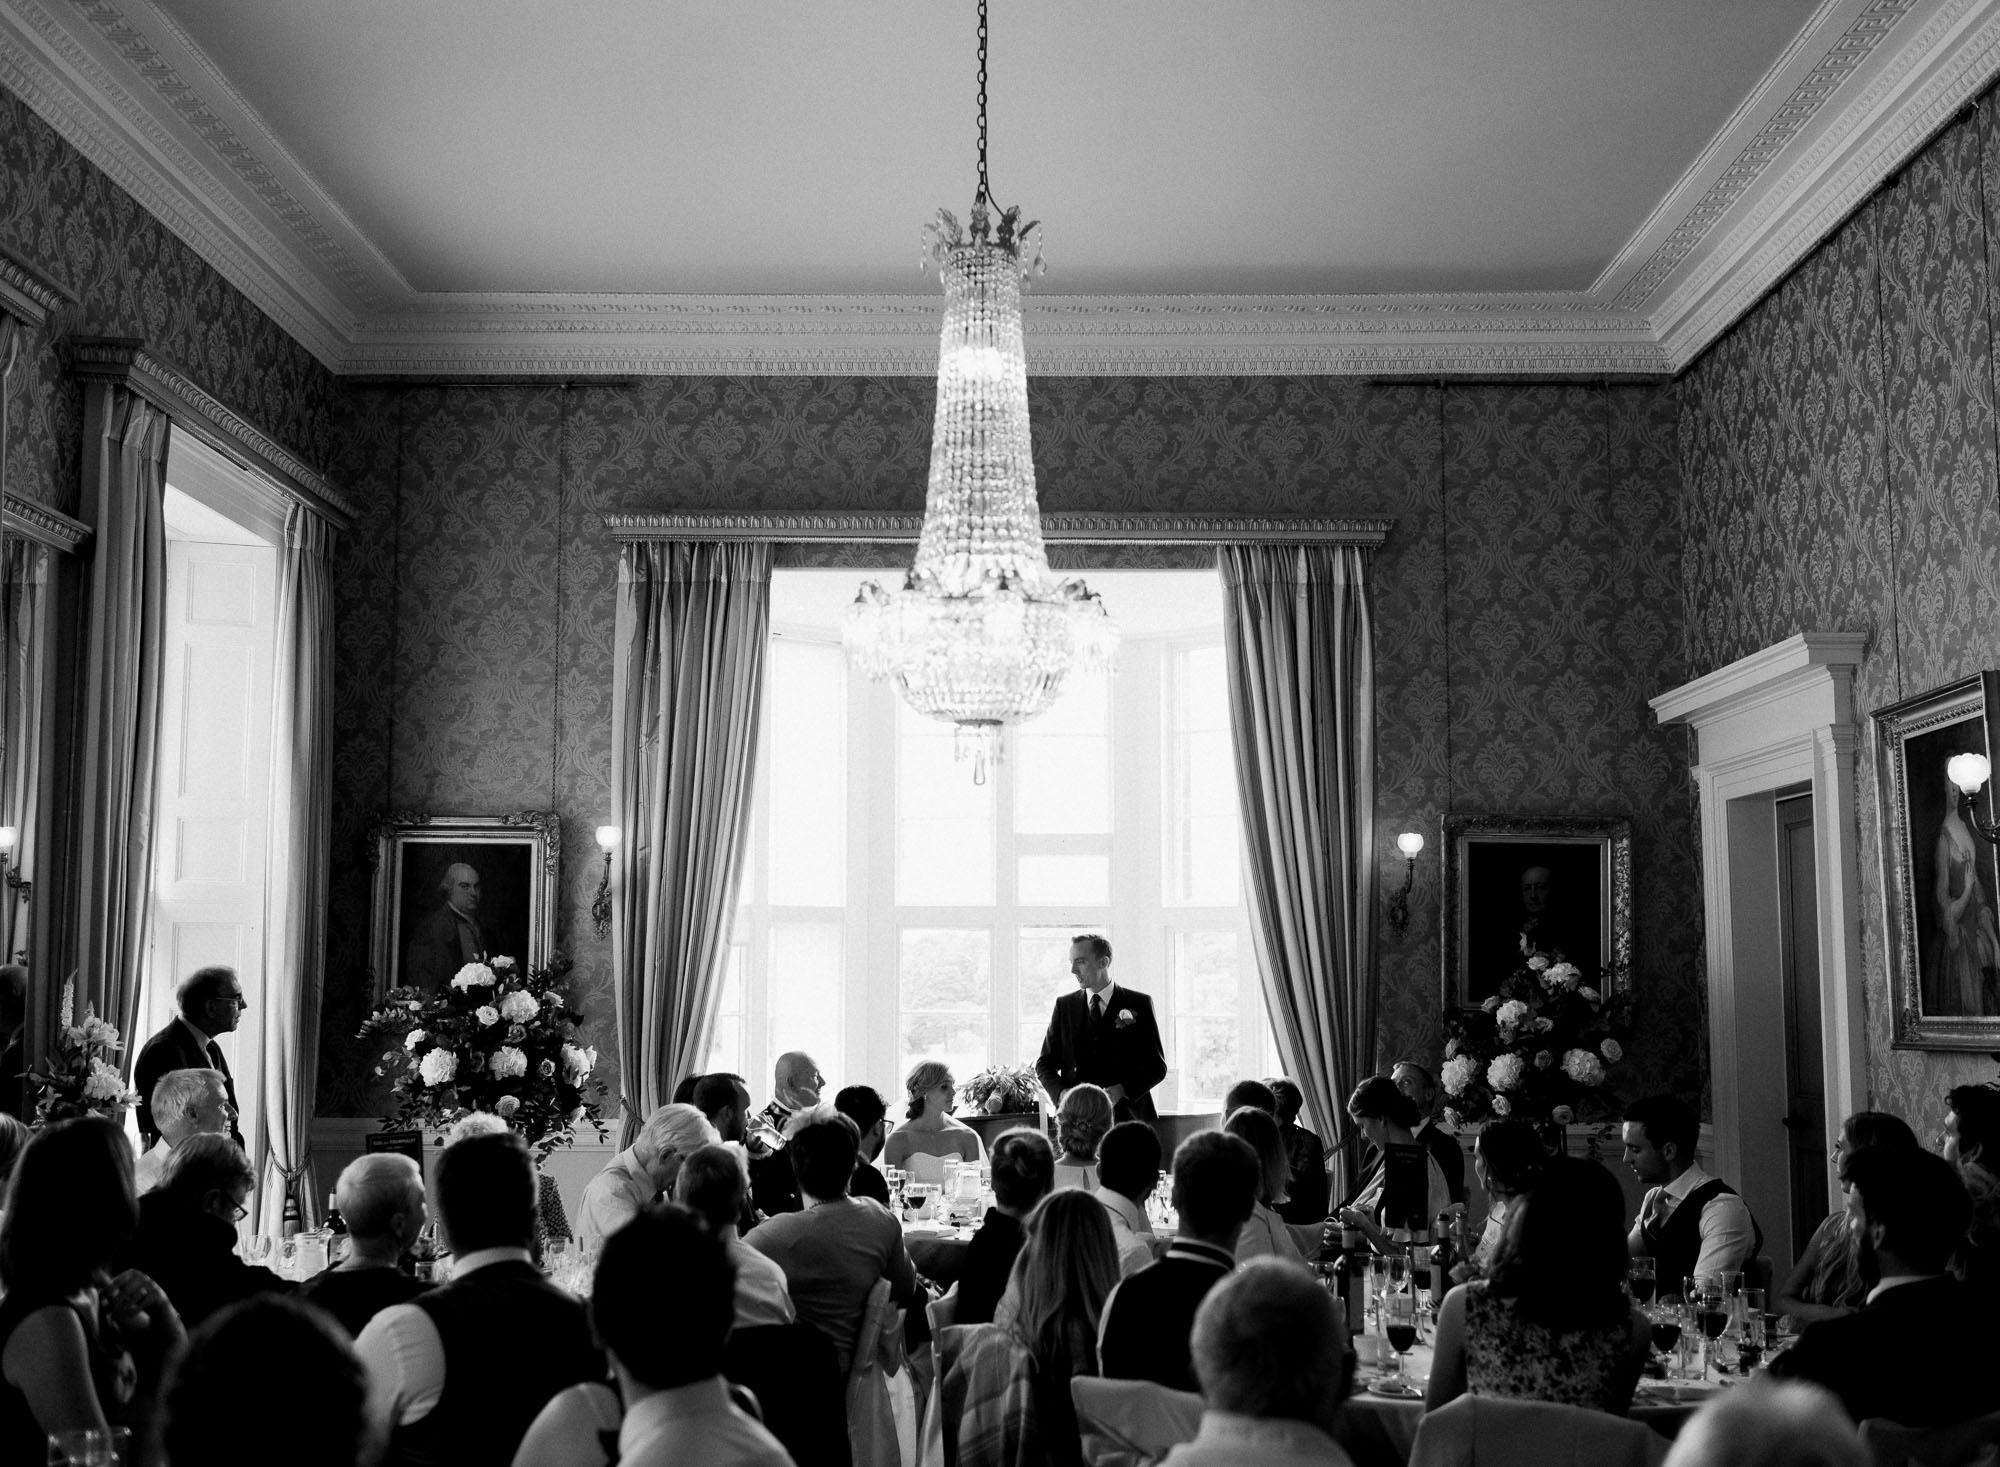 scottish_wedding_blairquhan_castle-89.jpg